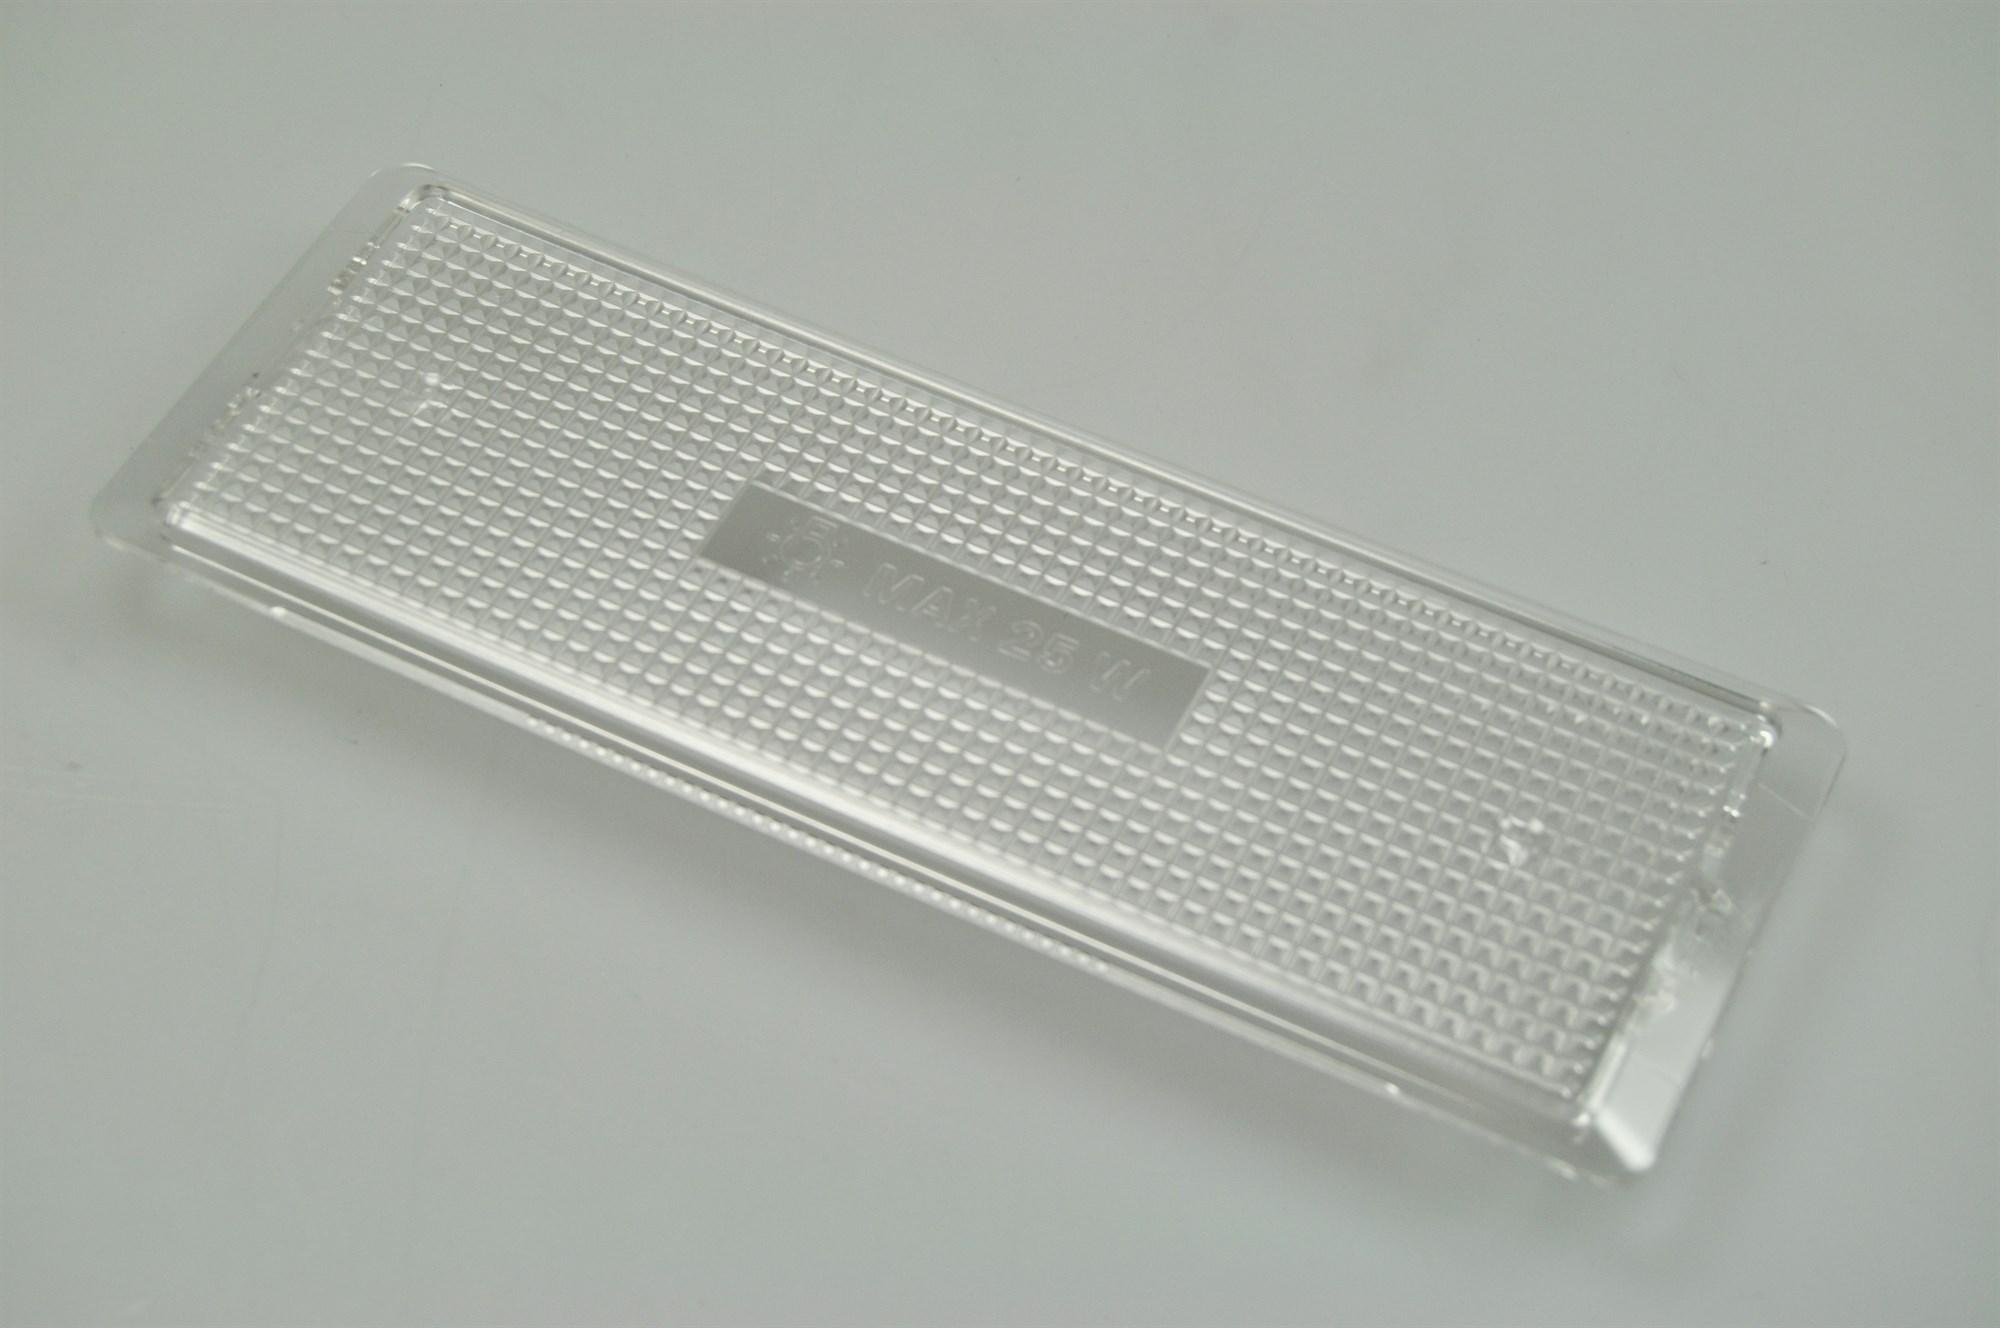 lampenabdeckung silverline dunstabzugshaube 60 mm. Black Bedroom Furniture Sets. Home Design Ideas